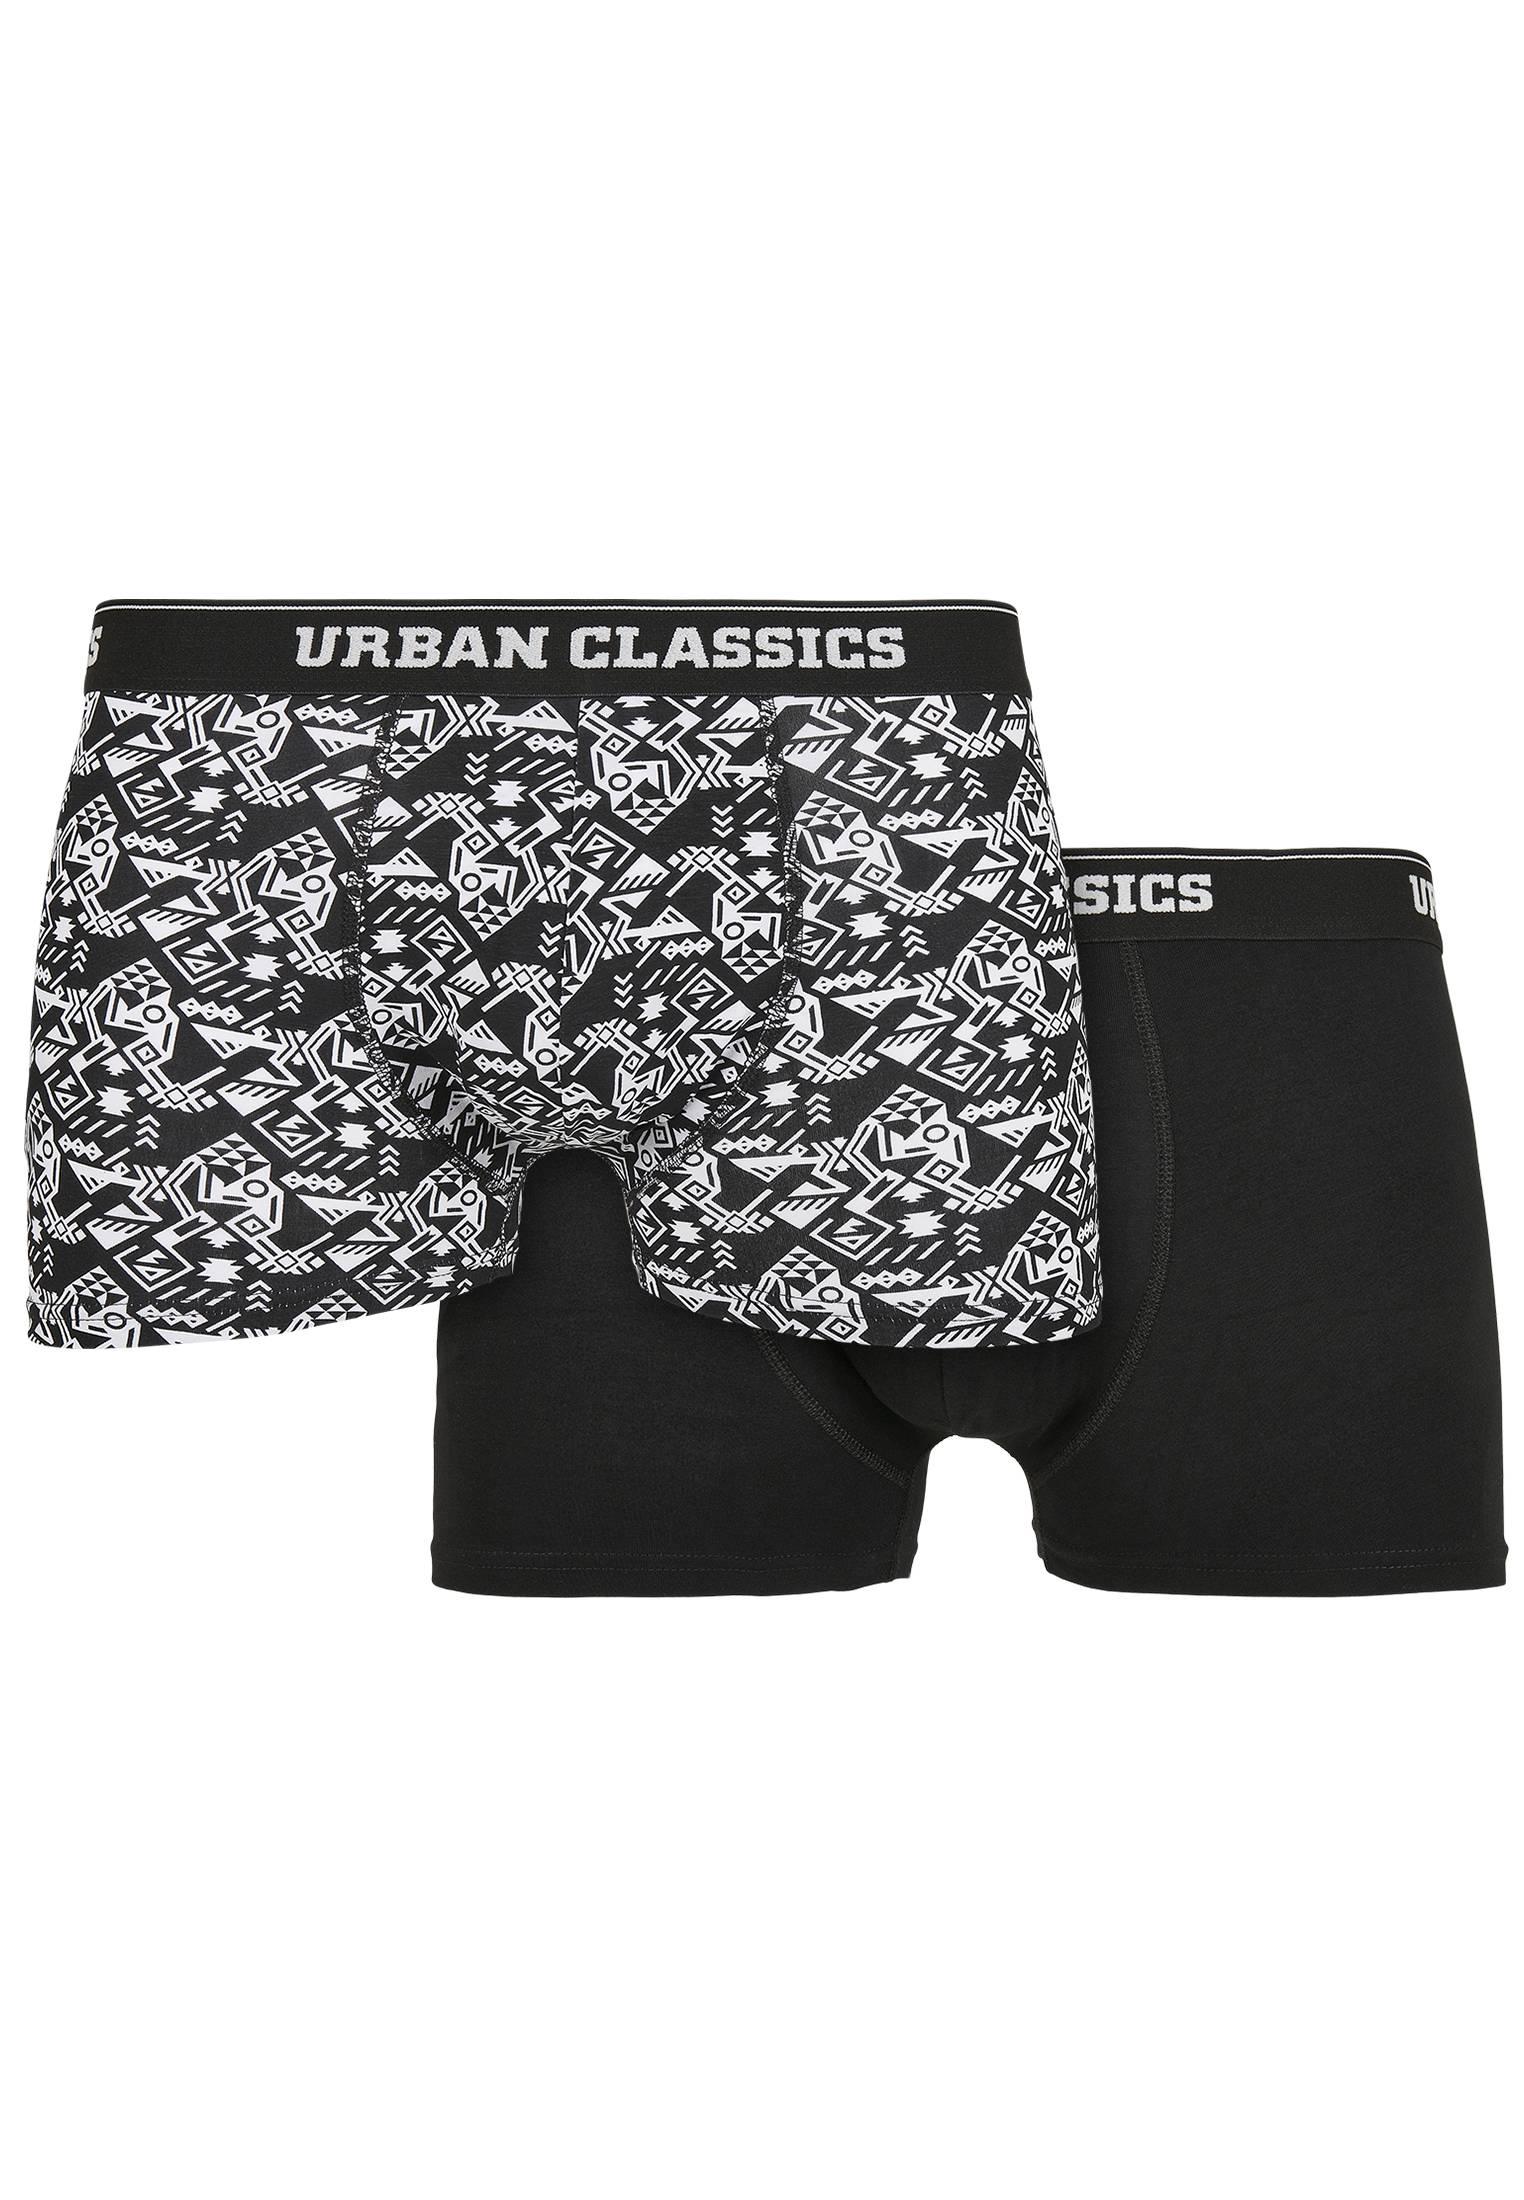 Urban Classics Organic Boxer Shorts 2-Pack detail aop+black - 3XL